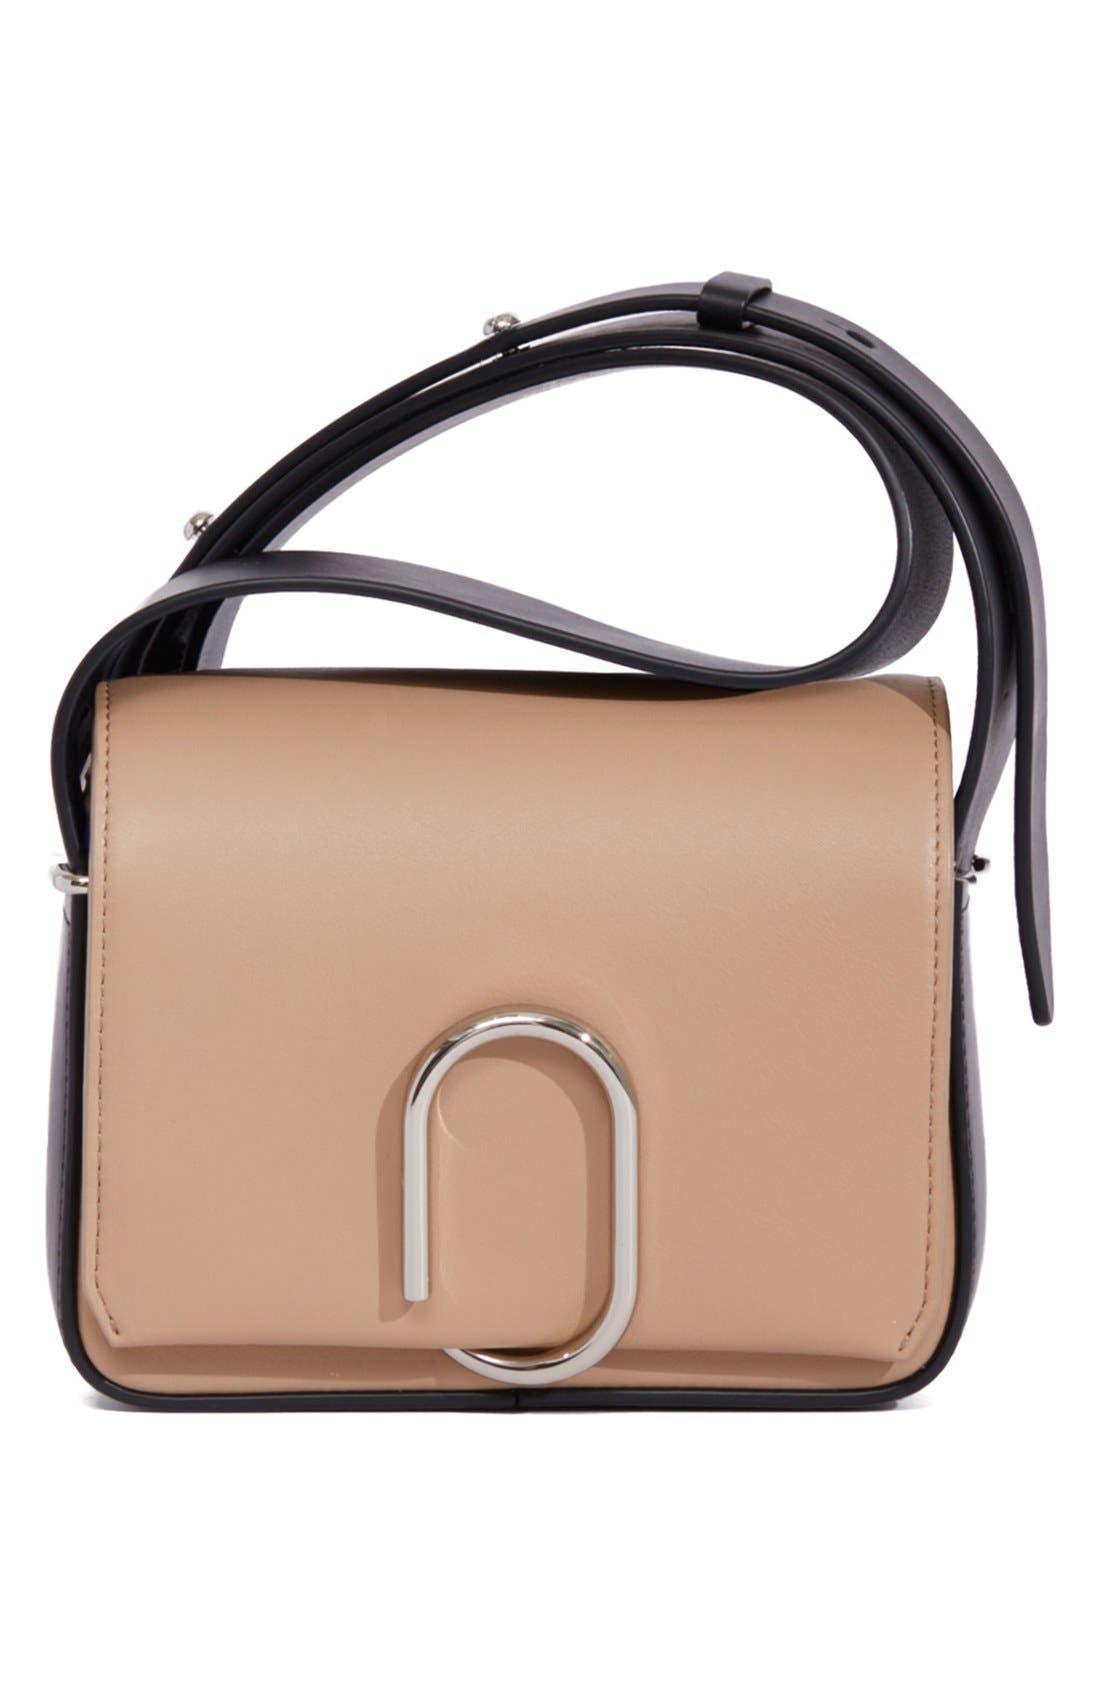 Main Image - 3.1 Phillip Lim 'Mini Alix' Leather Shoulder Bag